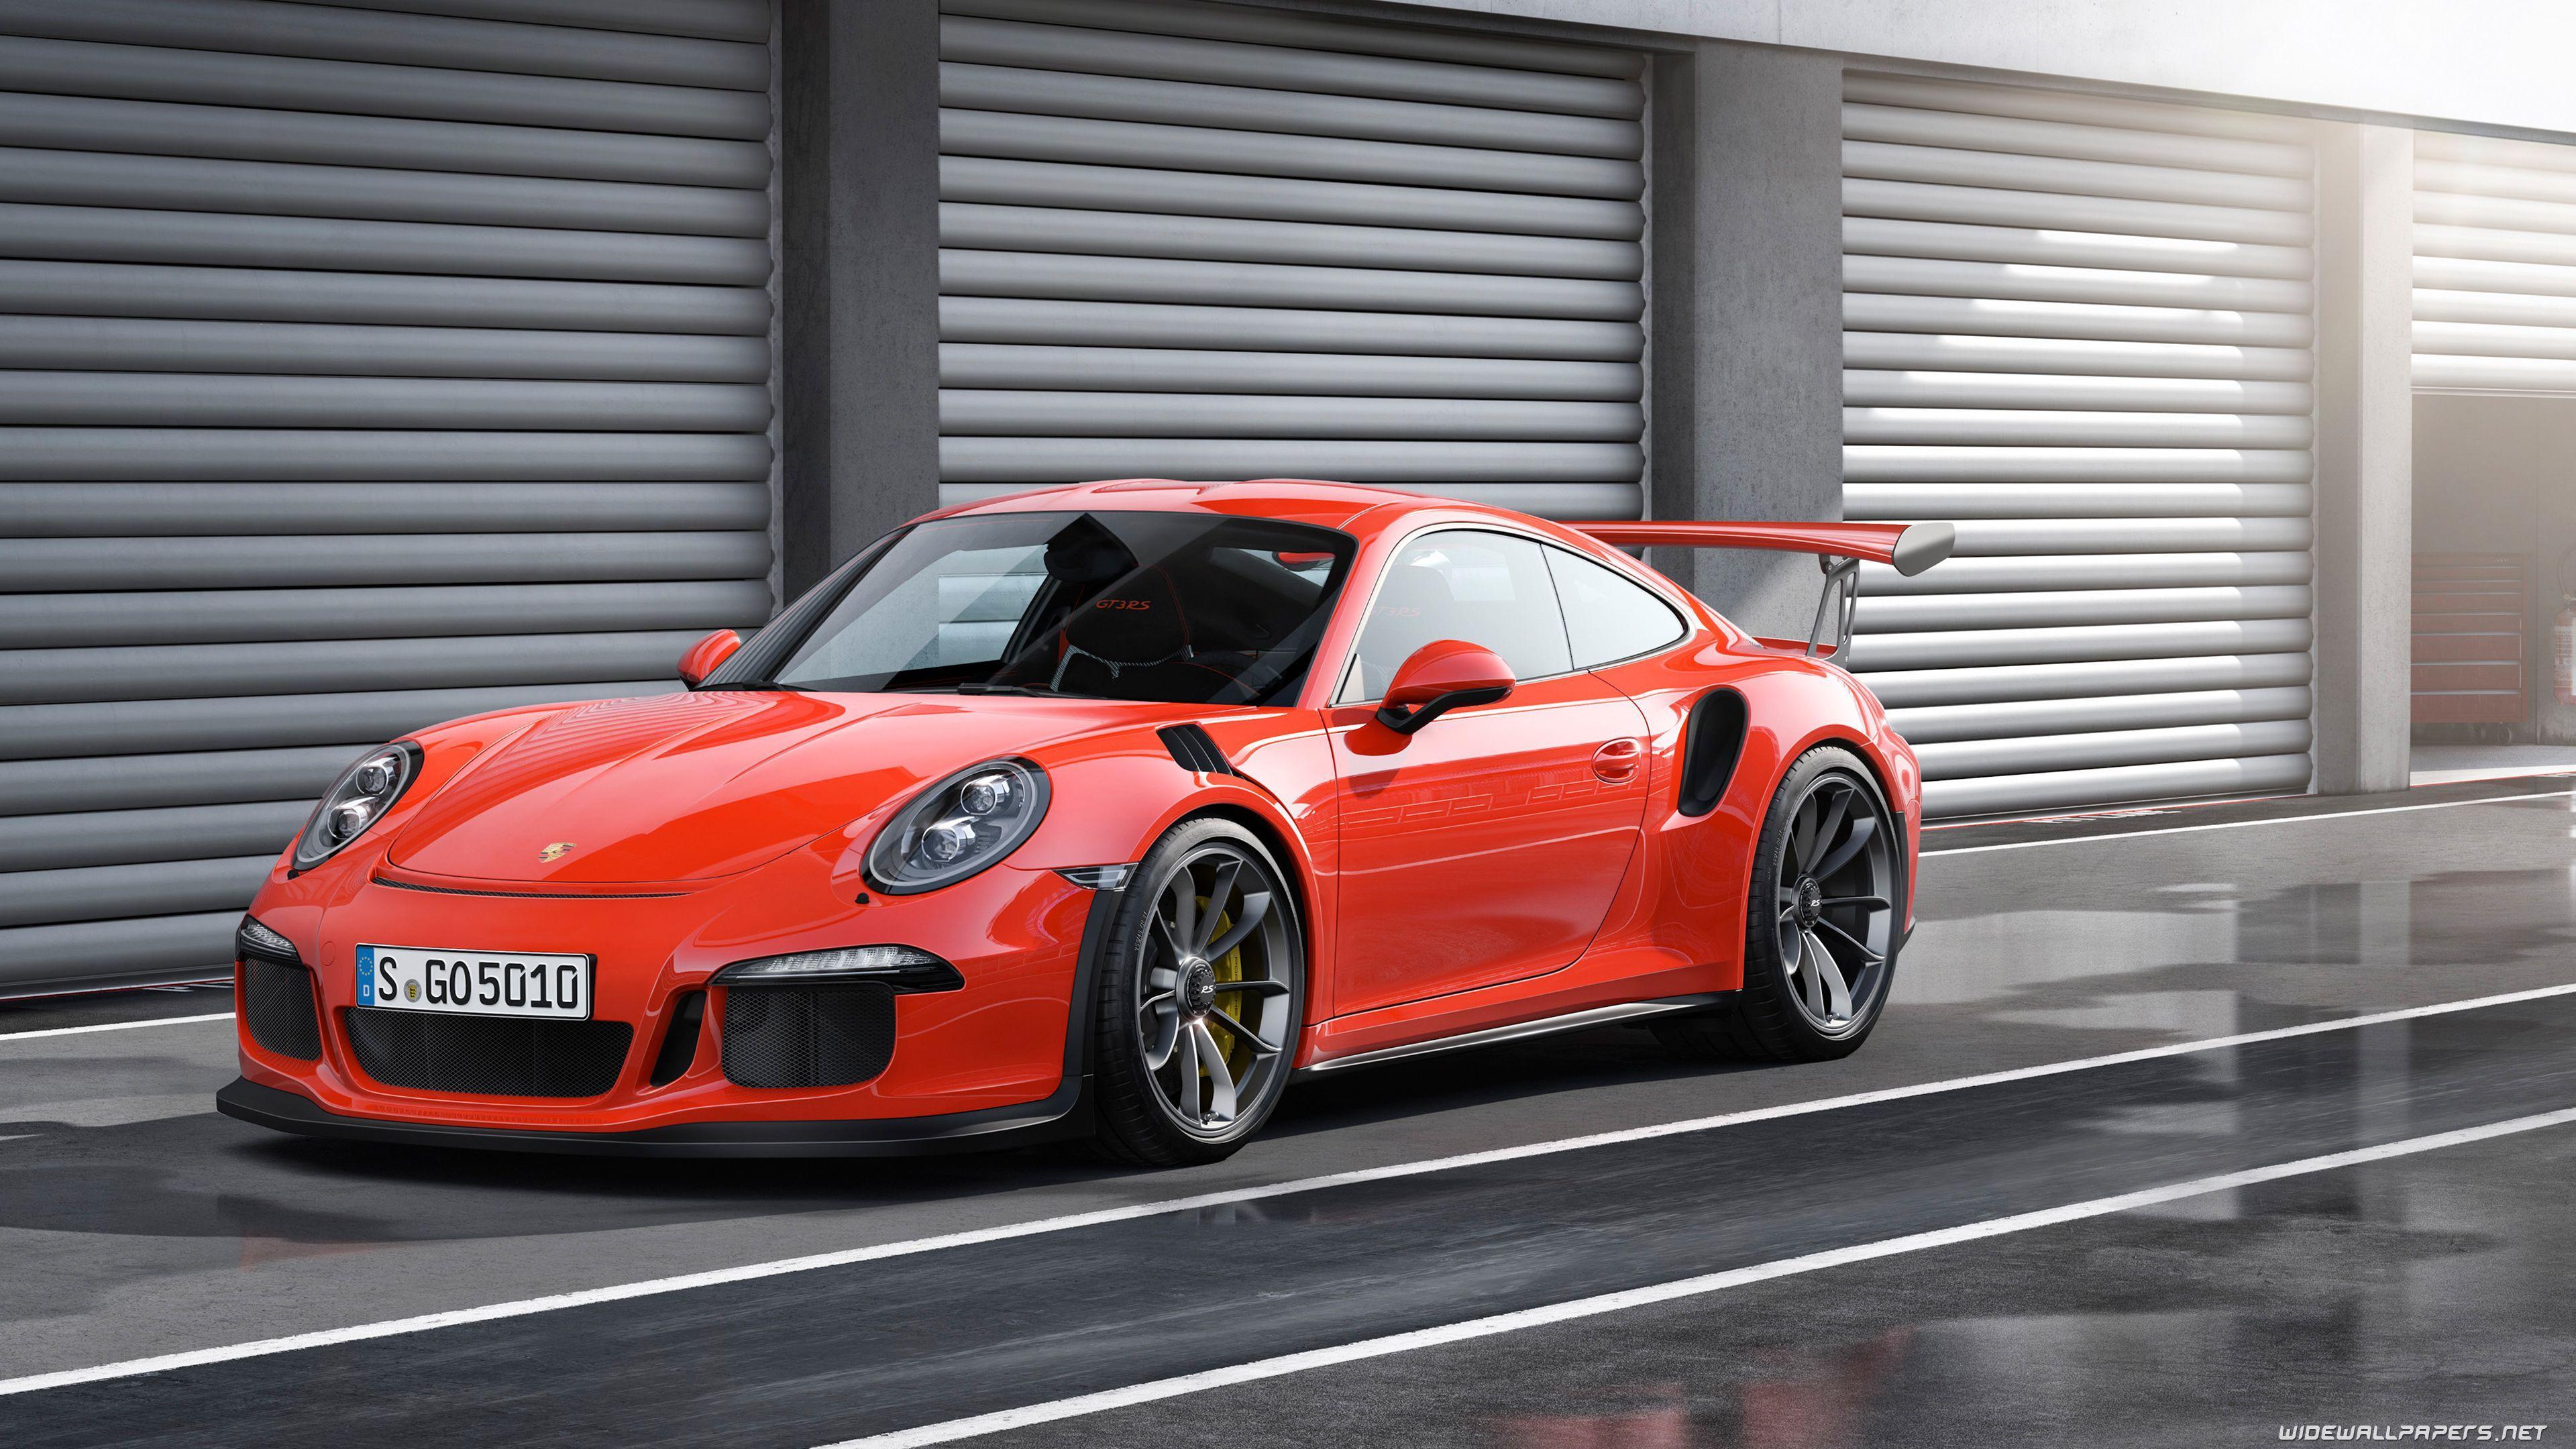 4k Ultra Hd Porsche Wallpapers Top Free 4k Ultra Hd